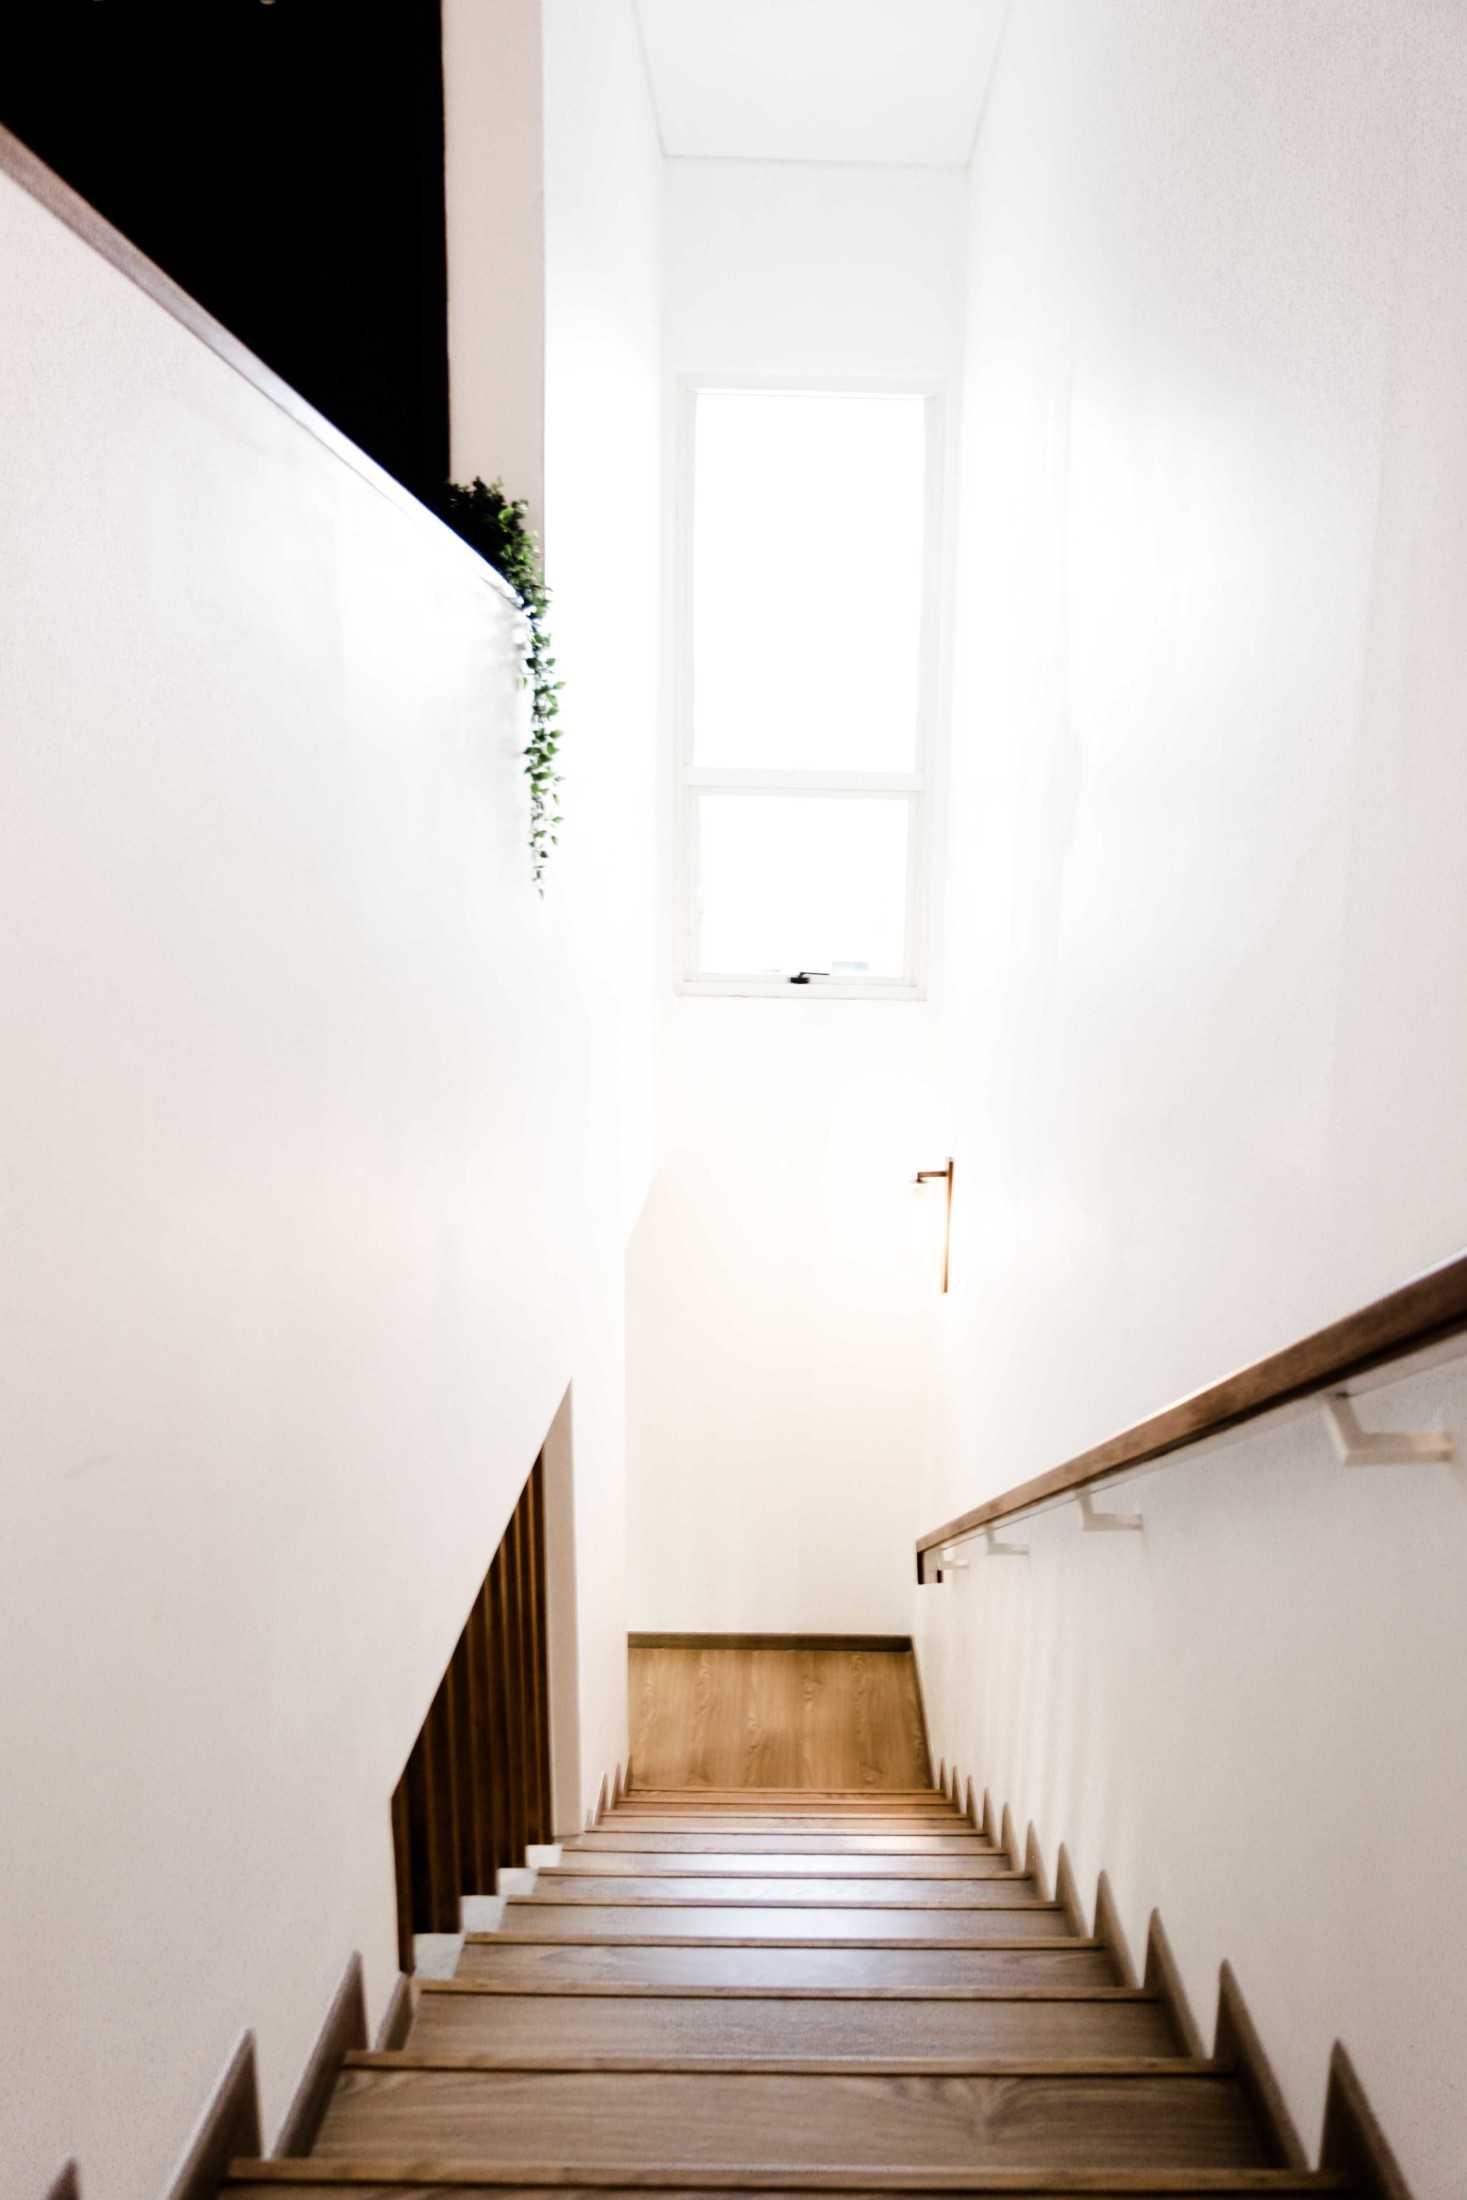 Samitrayasa Design Sh Residence Jakarta Selatan, Kota Jakarta Selatan, Daerah Khusus Ibukota Jakarta, Indonesia Jakarta Selatan, Kota Jakarta Selatan, Daerah Khusus Ibukota Jakarta, Indonesia Samitrayasa-Design-Sh-Residence  108329